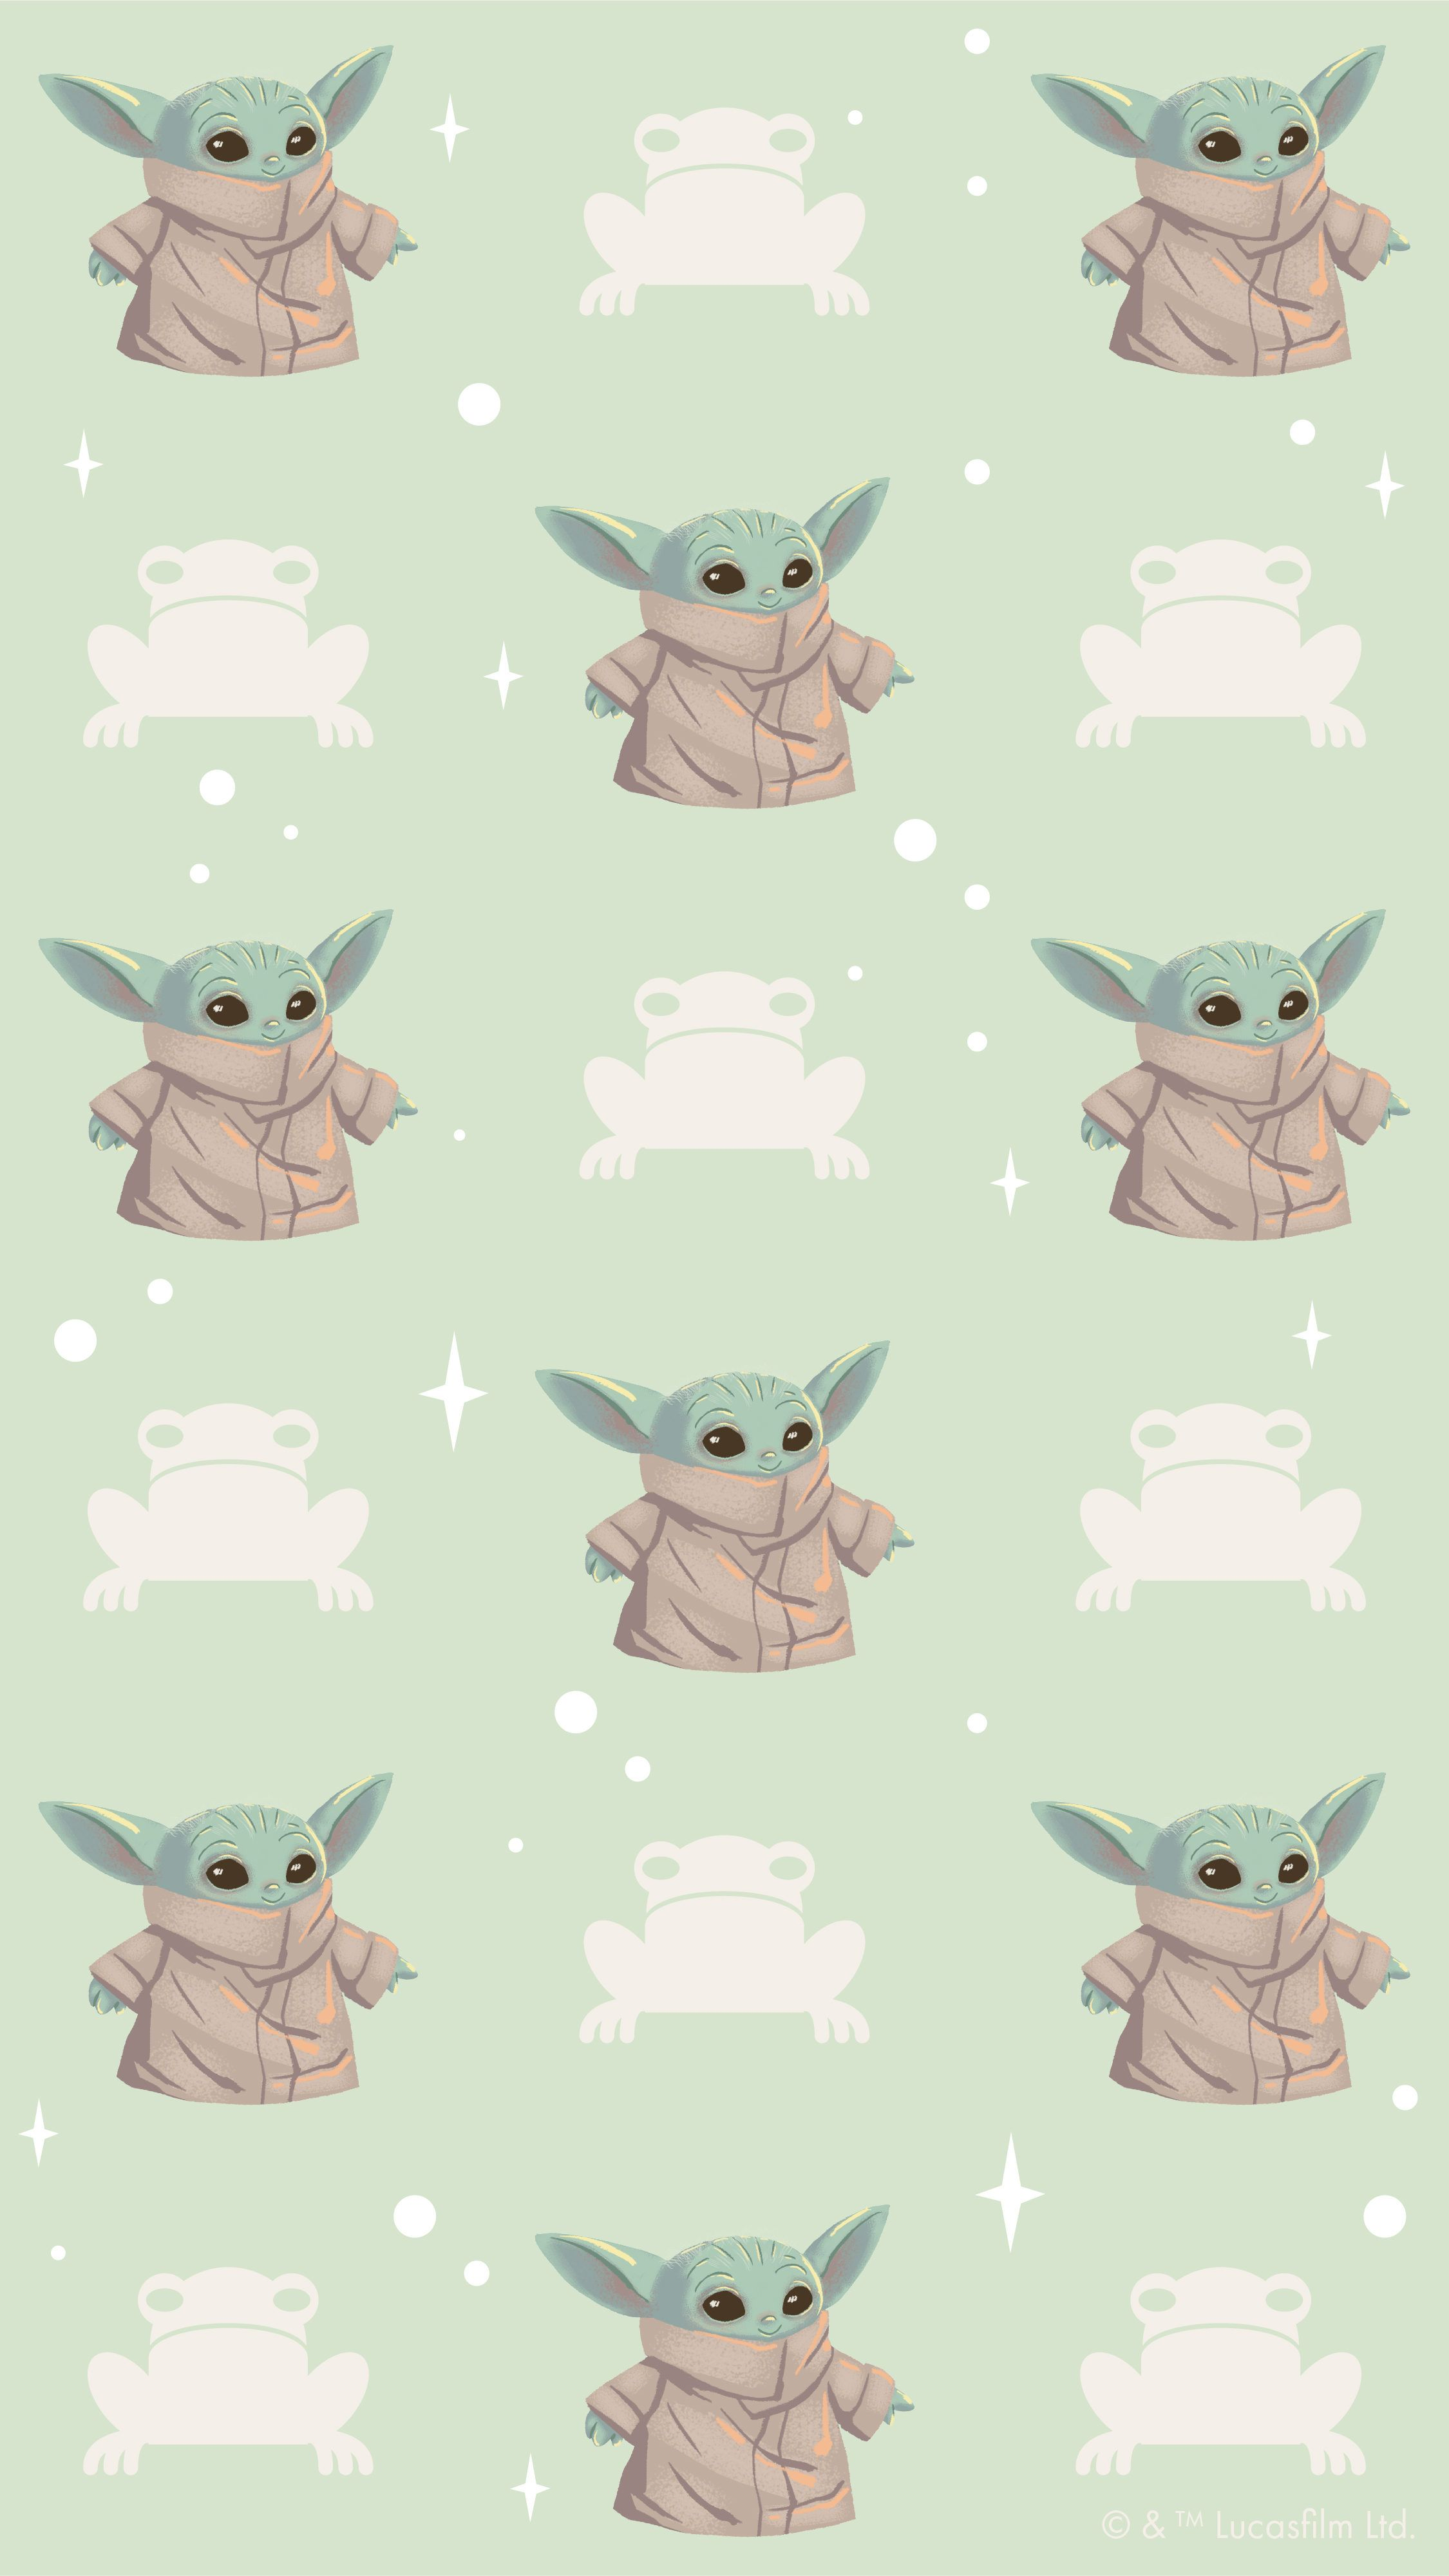 The Child X Colourpop Phone Wallpaper Cute Cartoon Wallpapers Yoda Wallpaper Star Wars Artwork